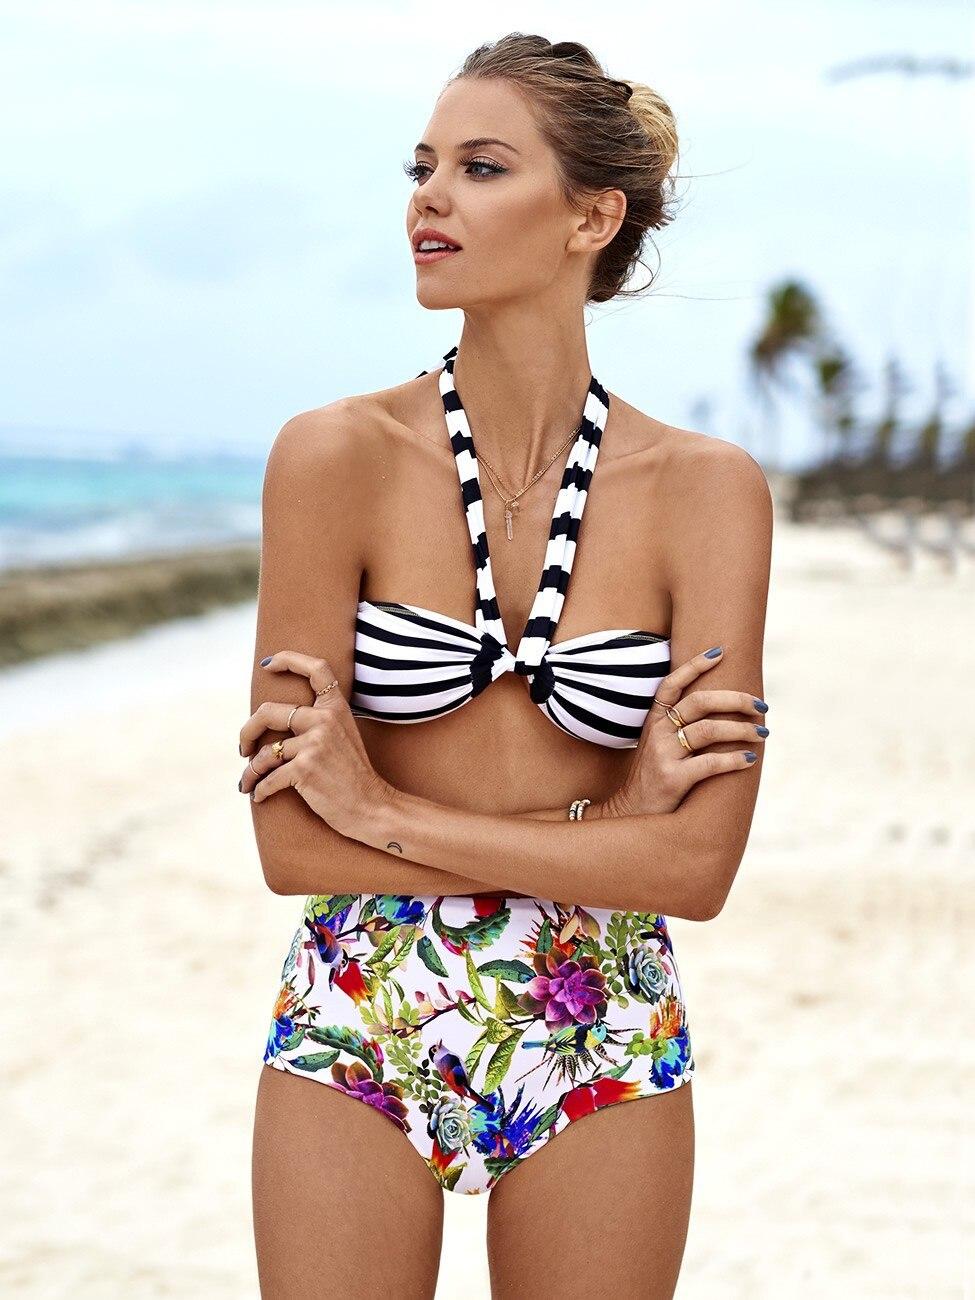 Style Women Striped Printed Strappy High Waist Bikini Swimsuit Hollow-Out Tankini Two Pieces Bathingsuit Beachwear Swimwear Wear